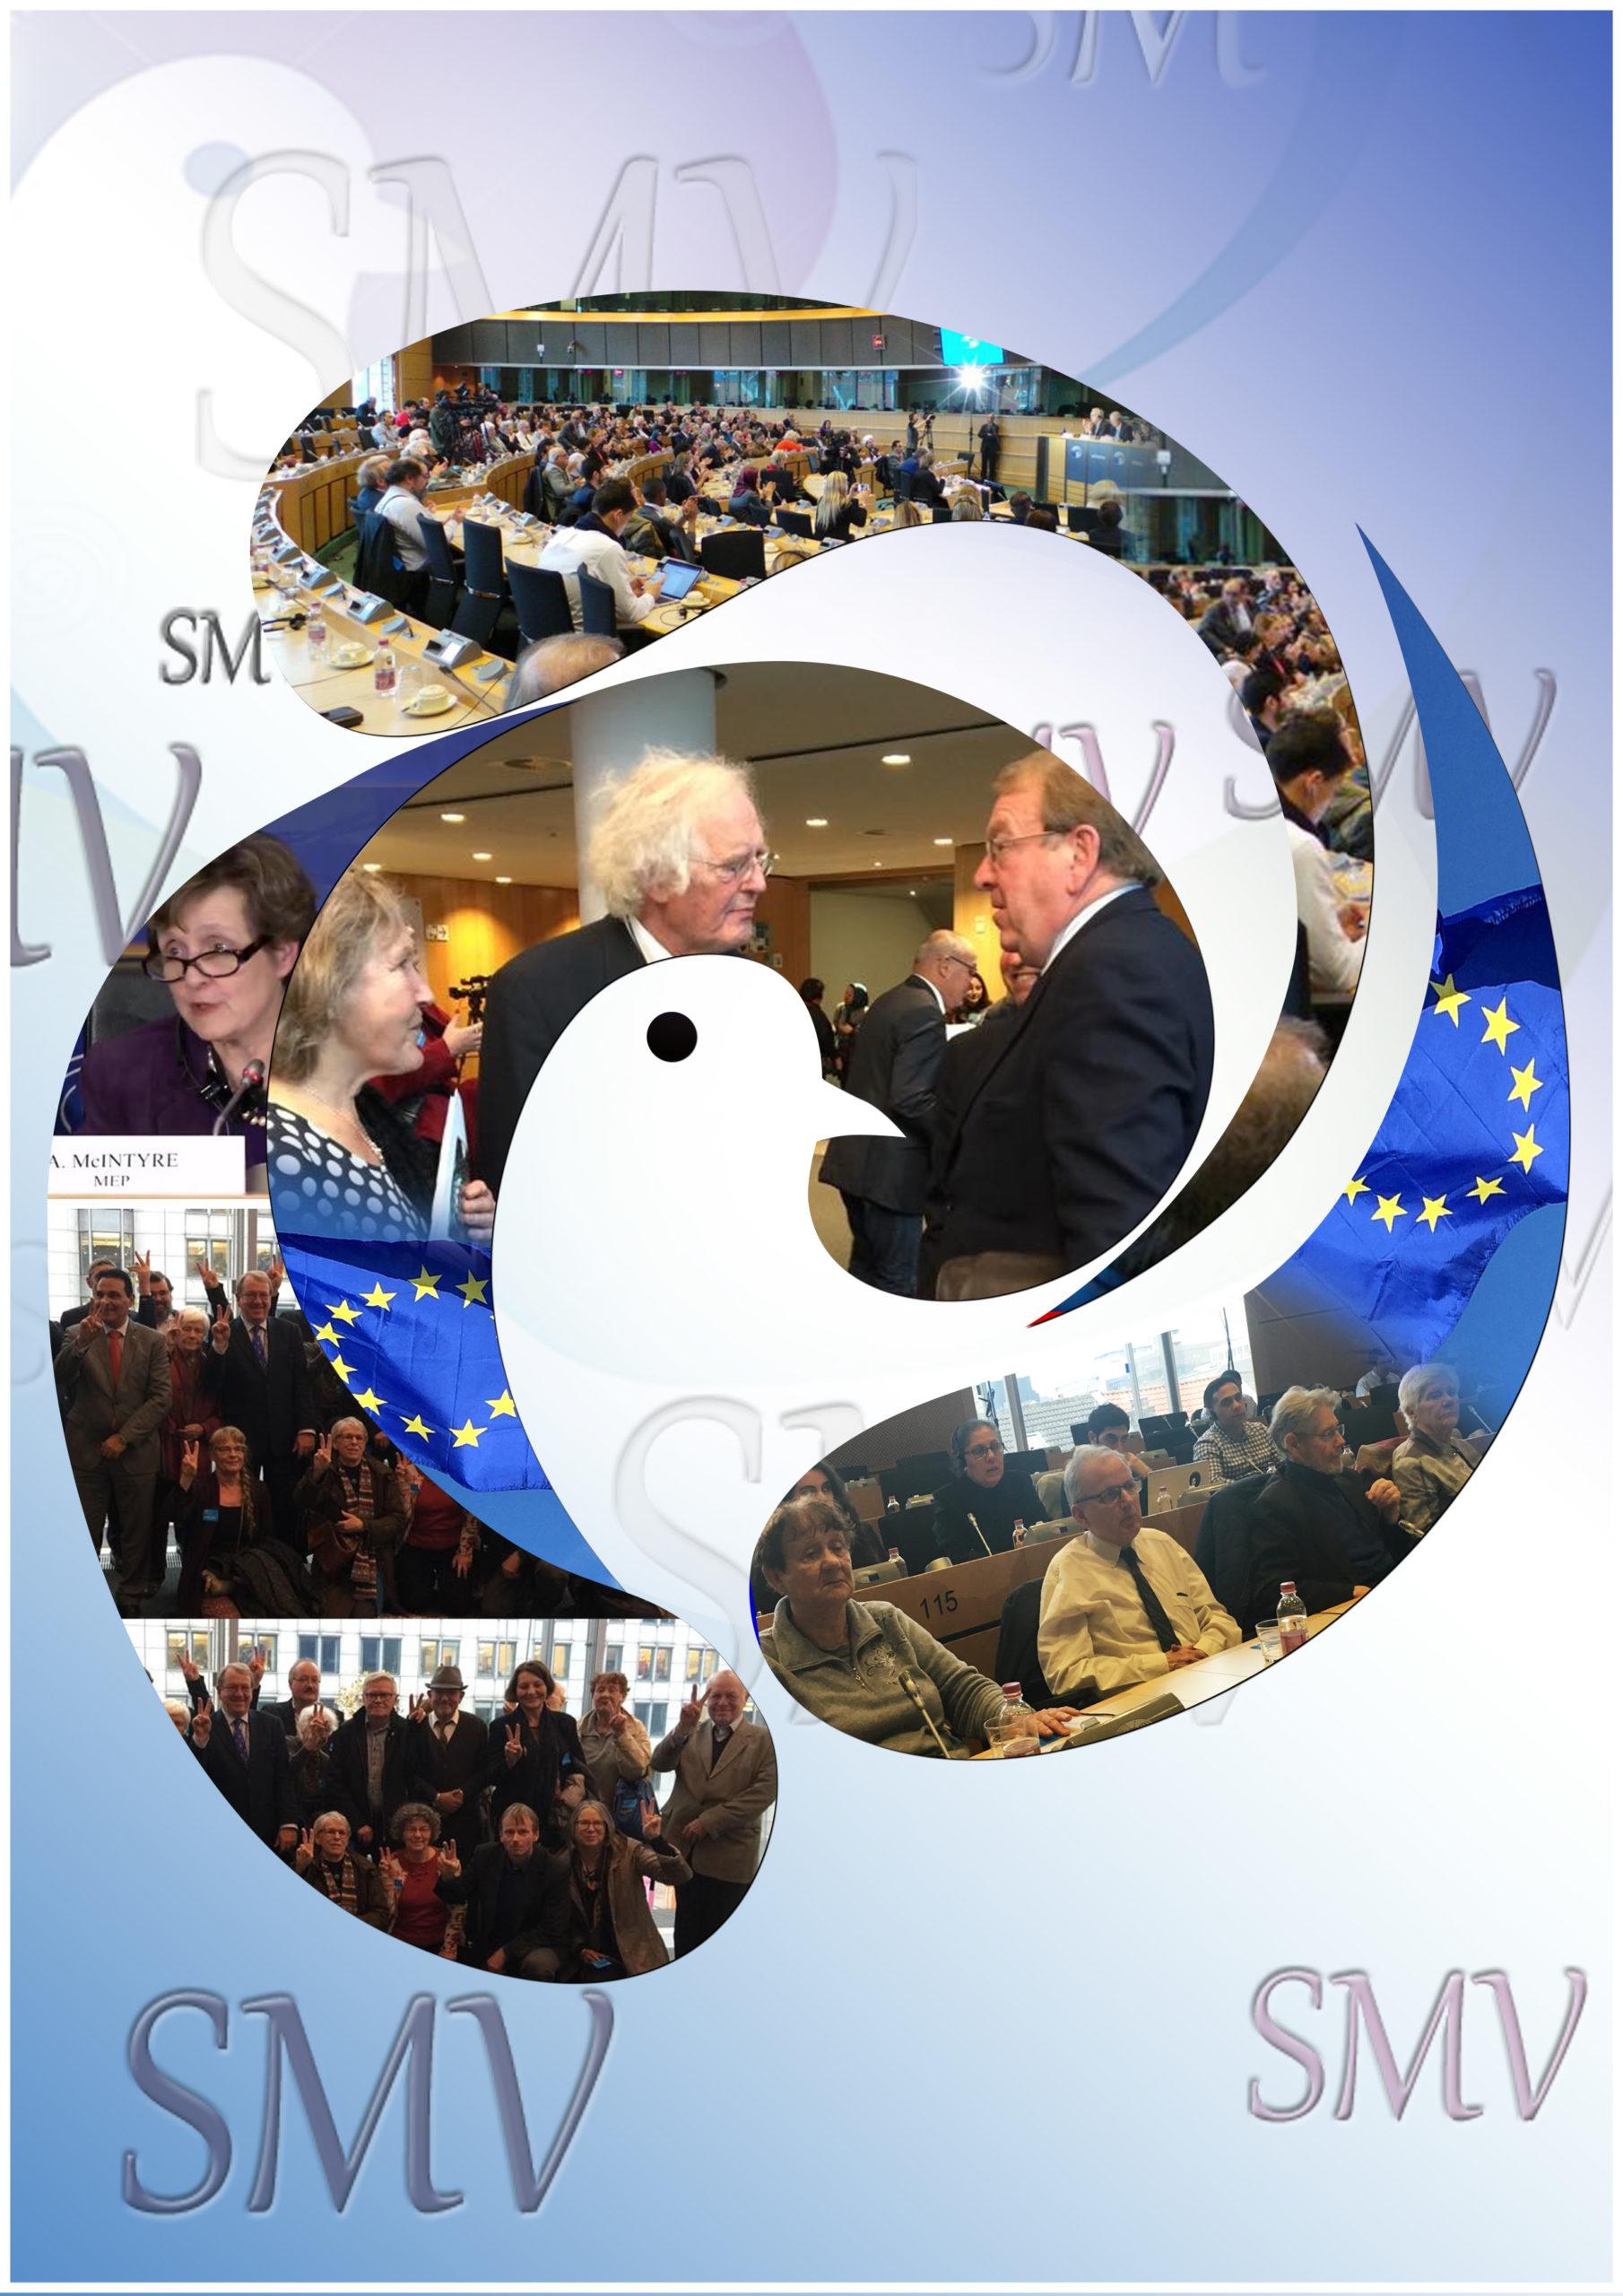 SMV - Brussel EU parlement 6 december 2017